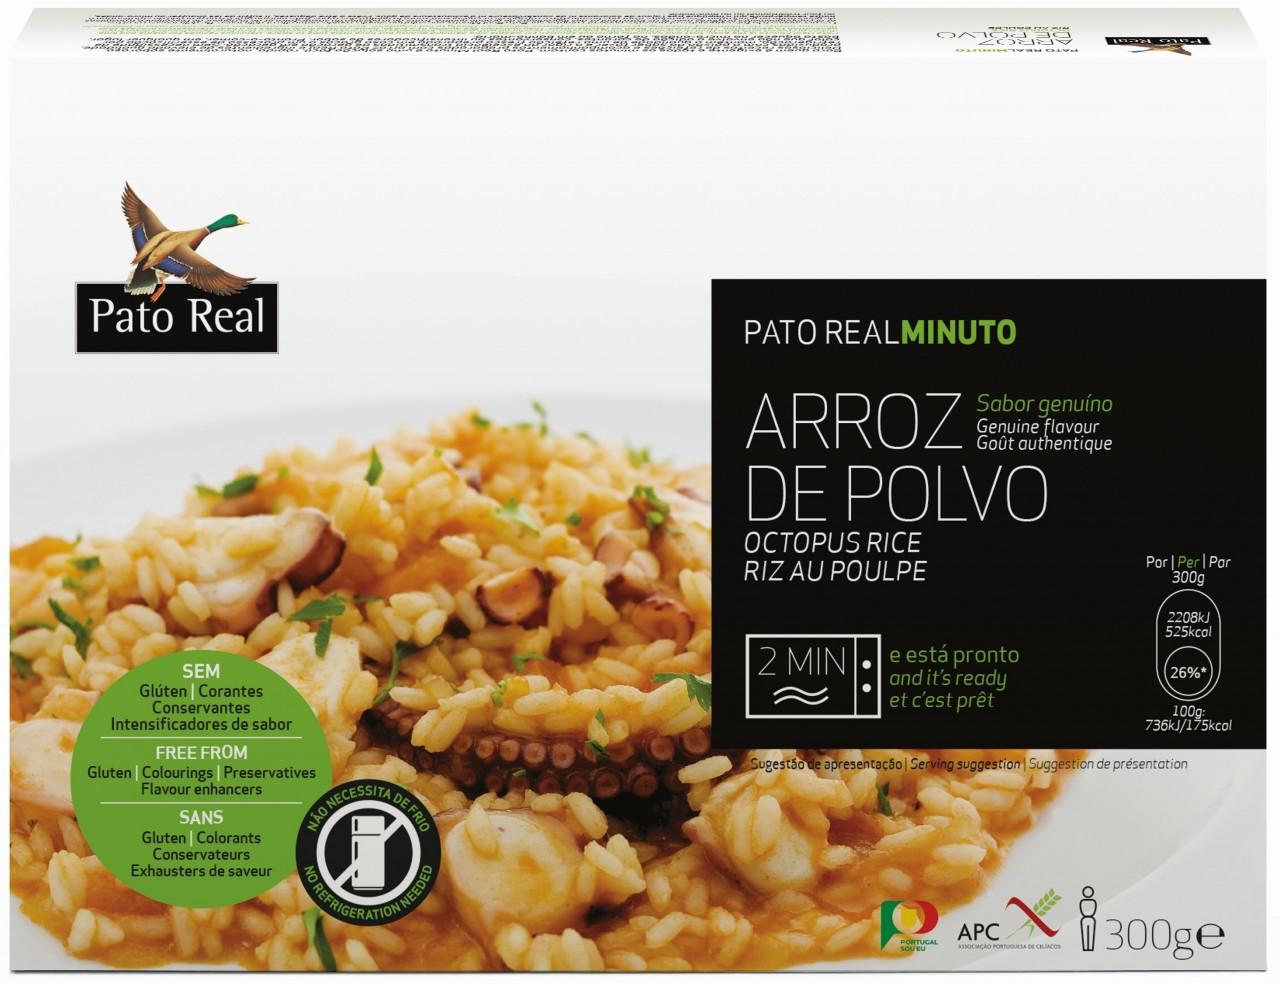 Reisgericht mit Oktopus - Arroz de Polvo 300gr. - Pato Real - Portugal